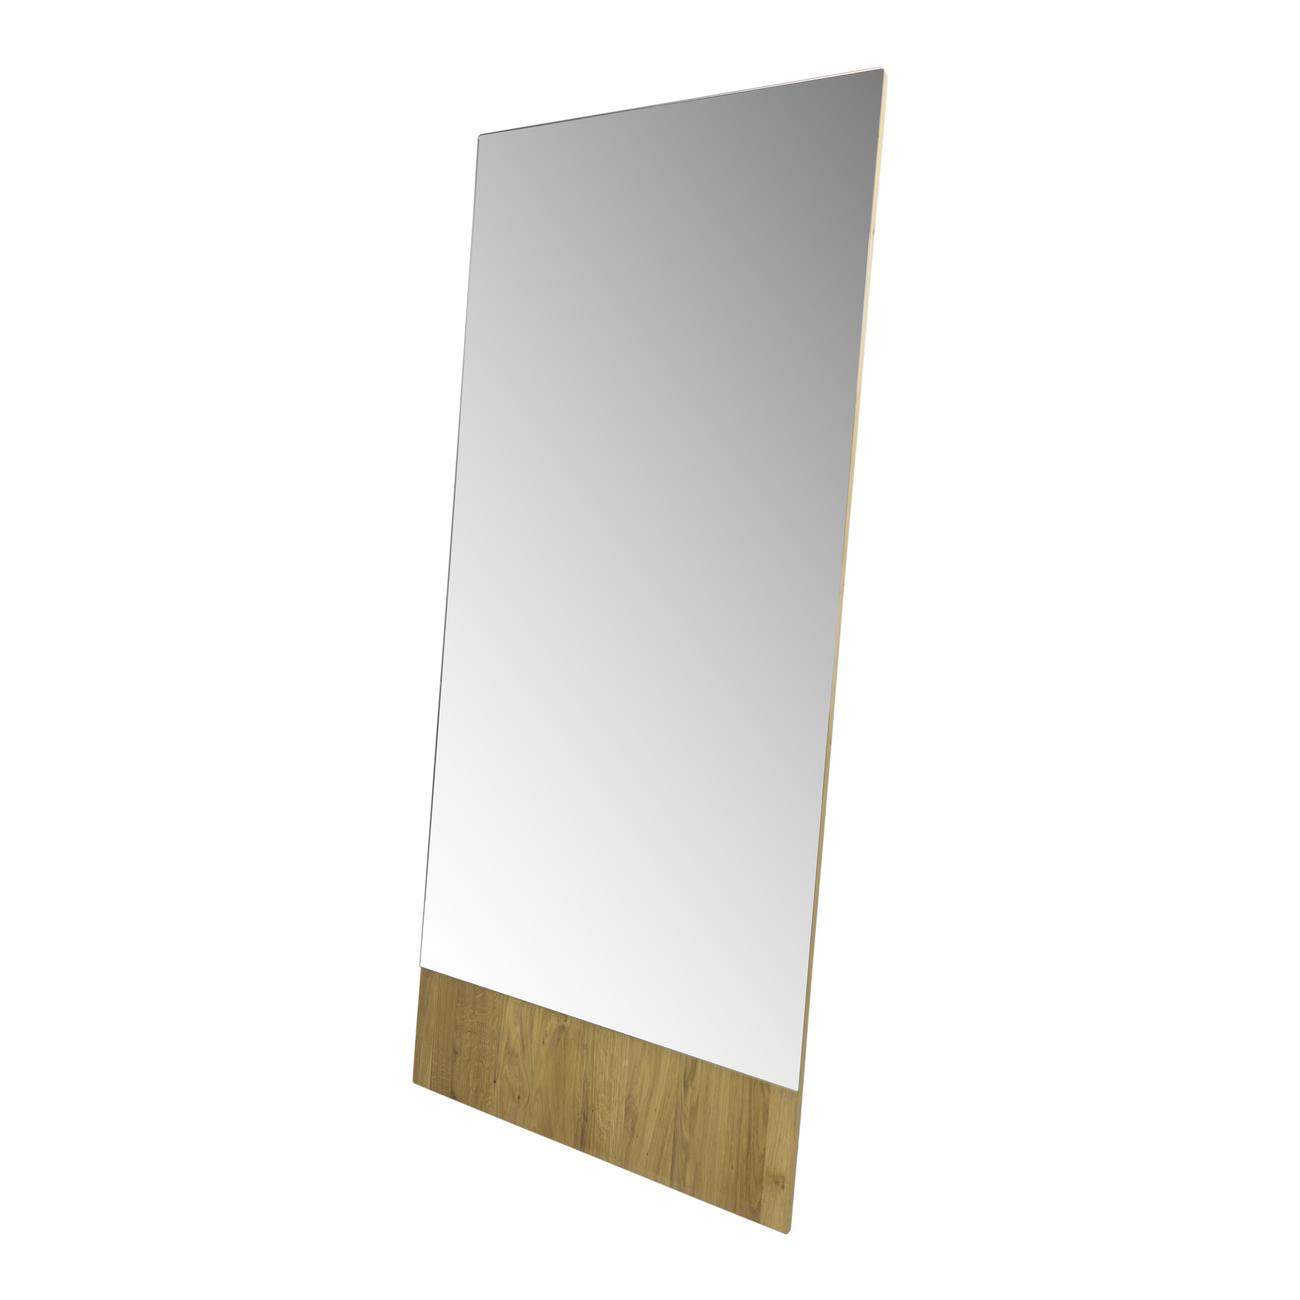 Torna Design Gentle spiegel